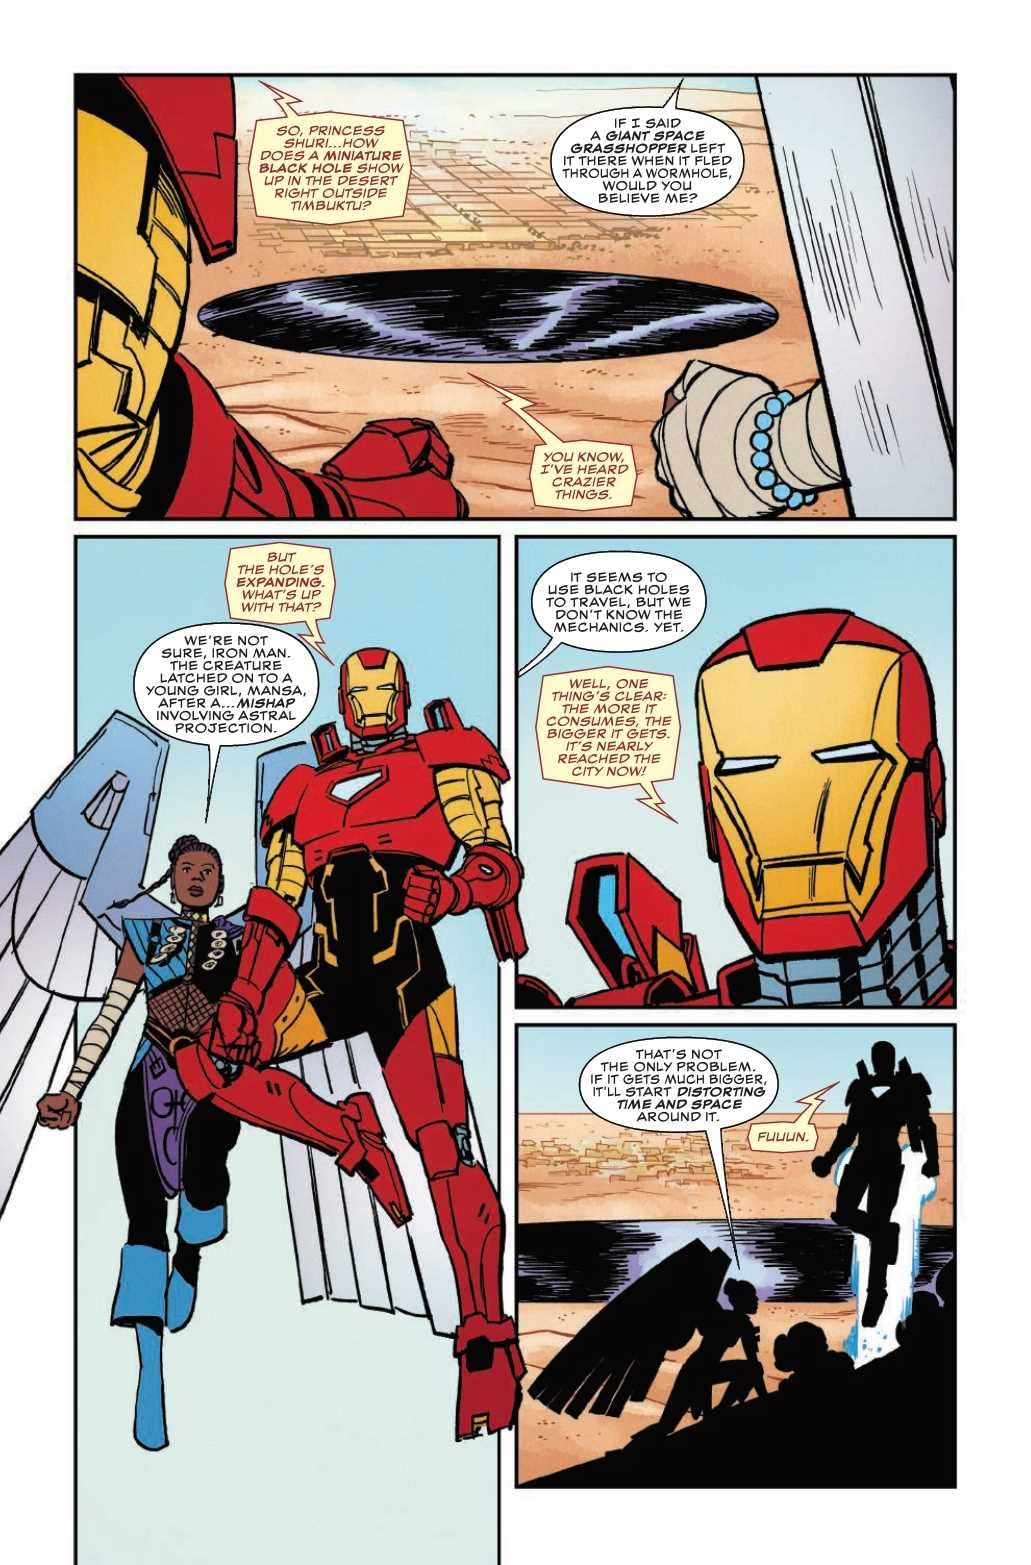 Terrible Ideas Follow Iron Man Everywhere in Next Week's Shuri #5 (Preview)